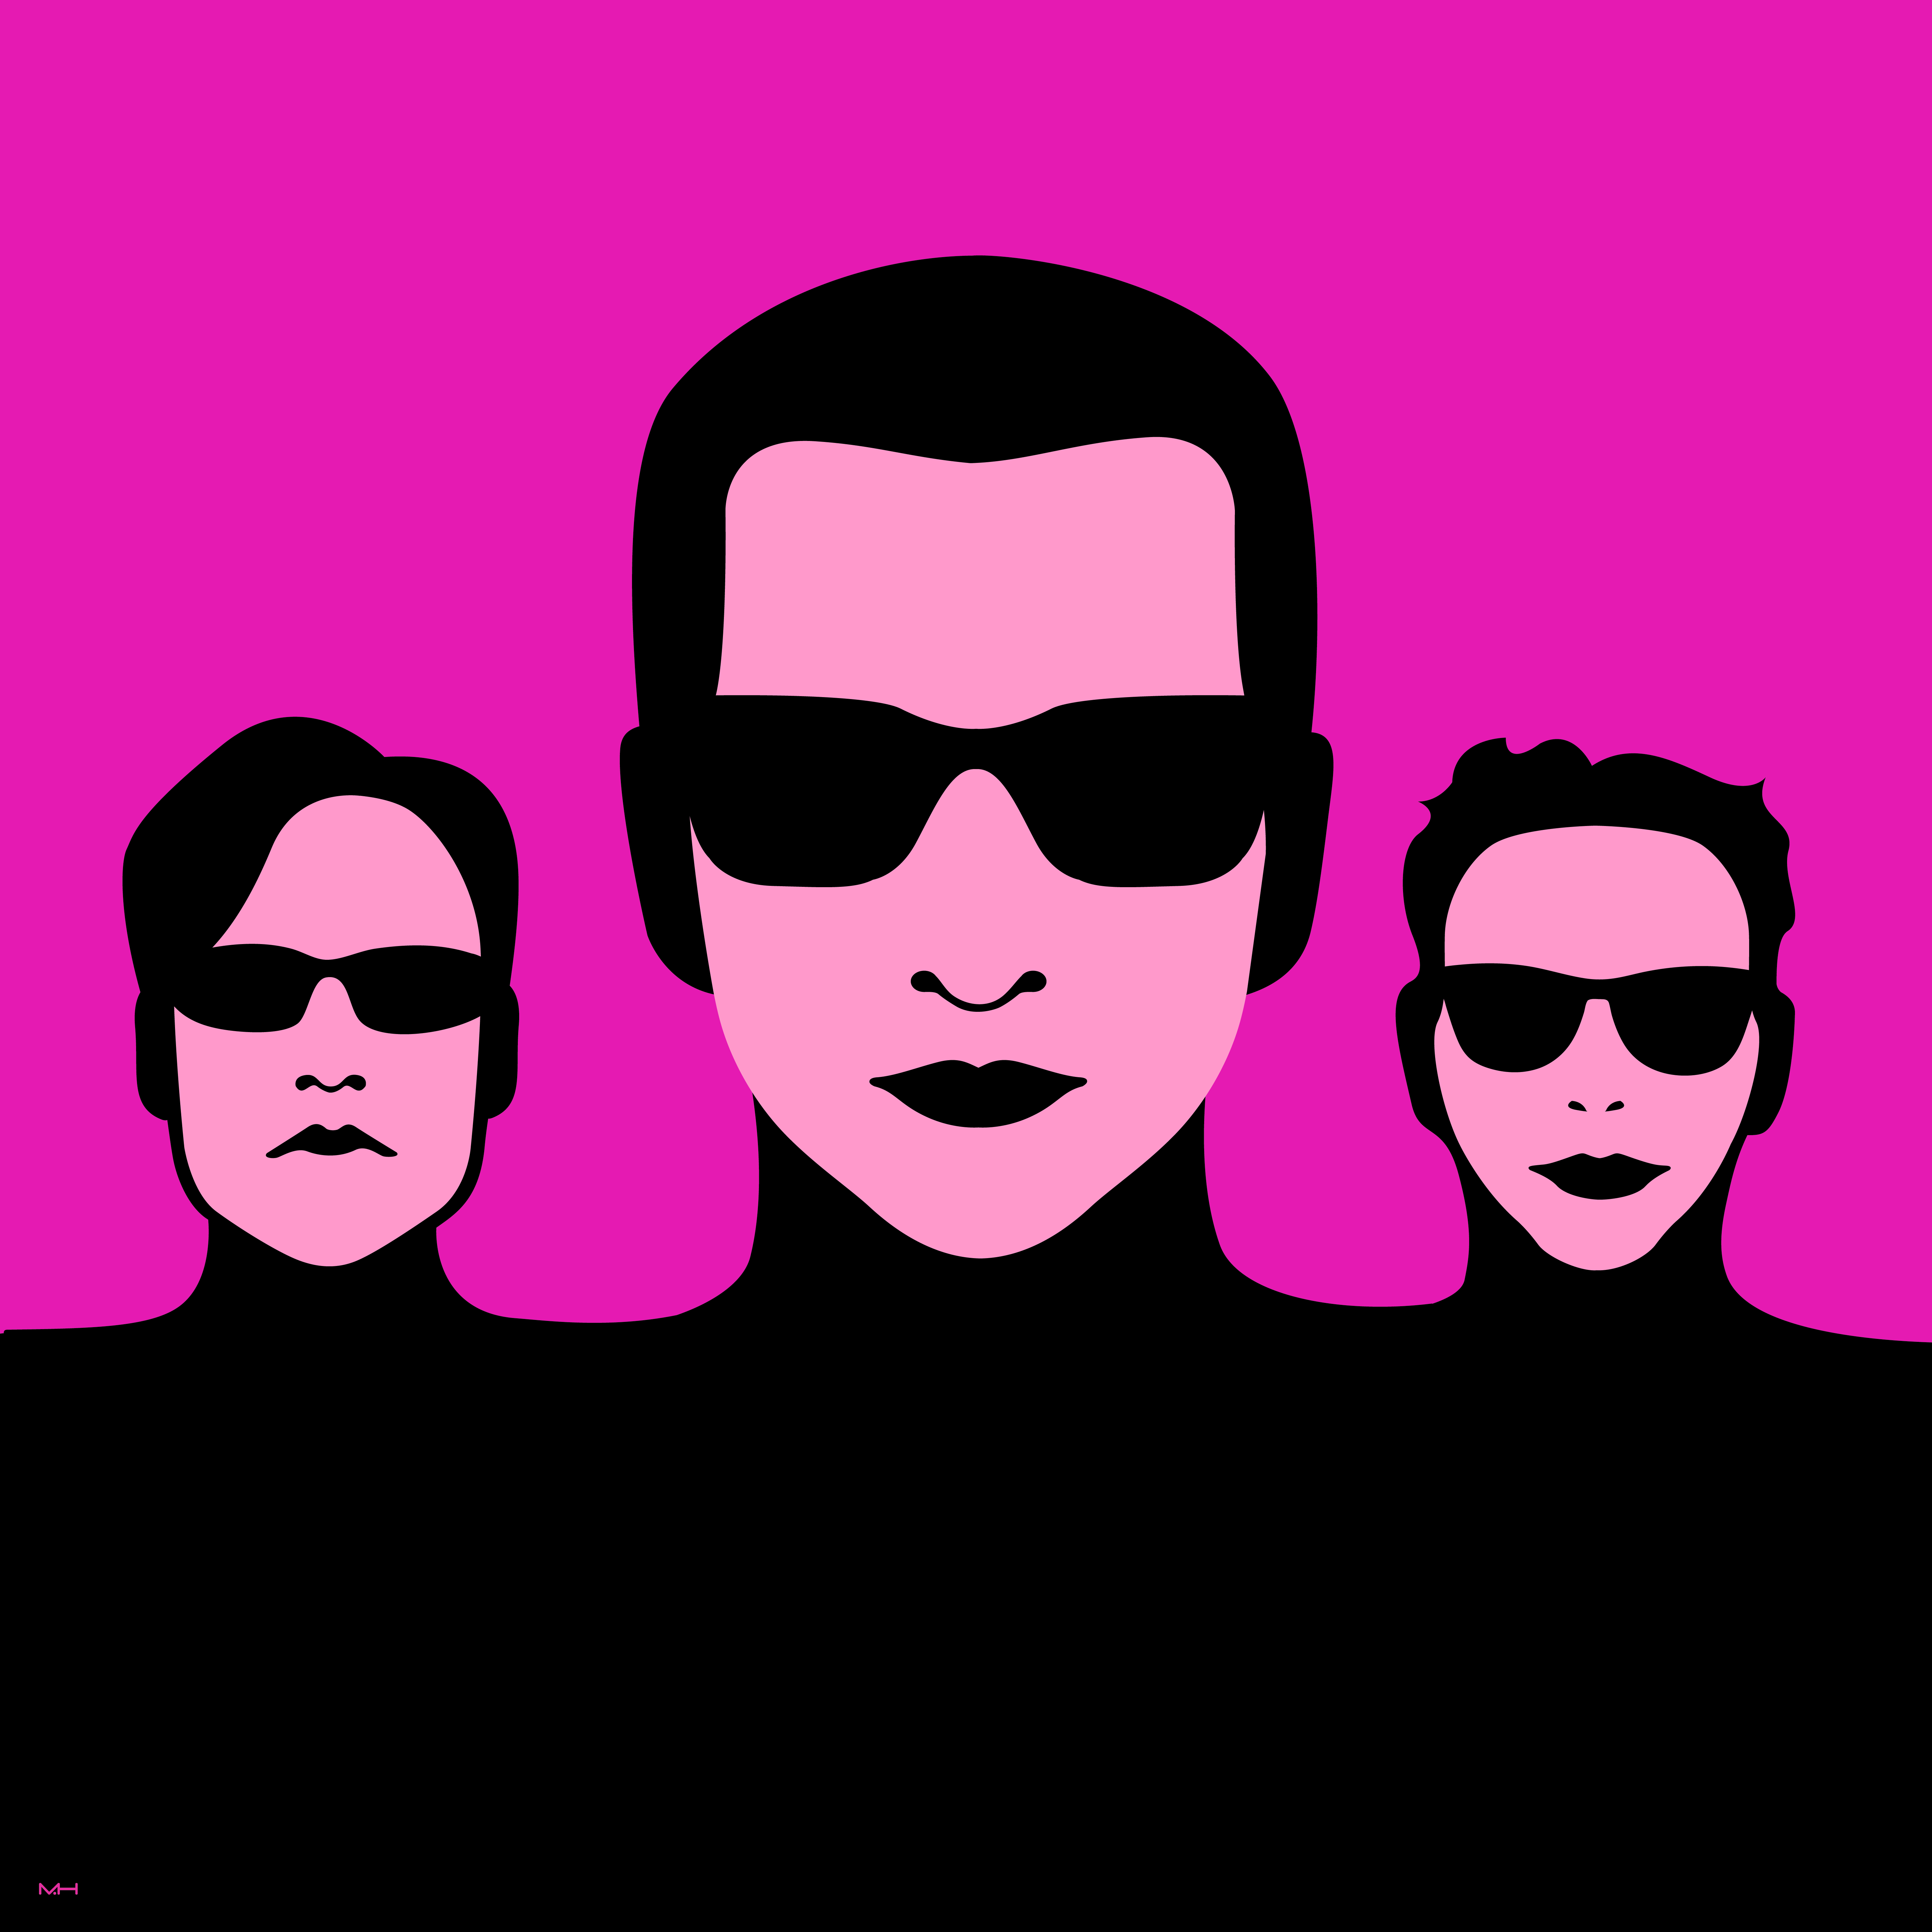 depeche mode_50x50.ai